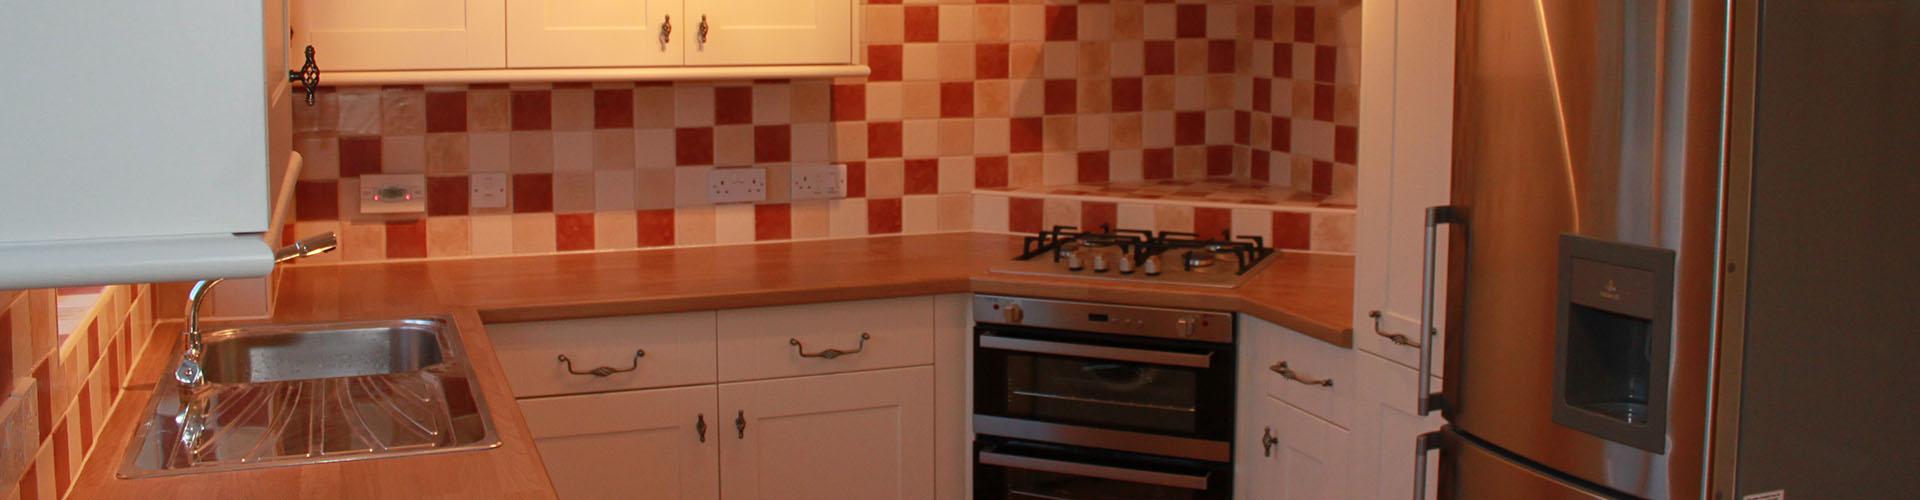 kitchens-bathrooms-wide